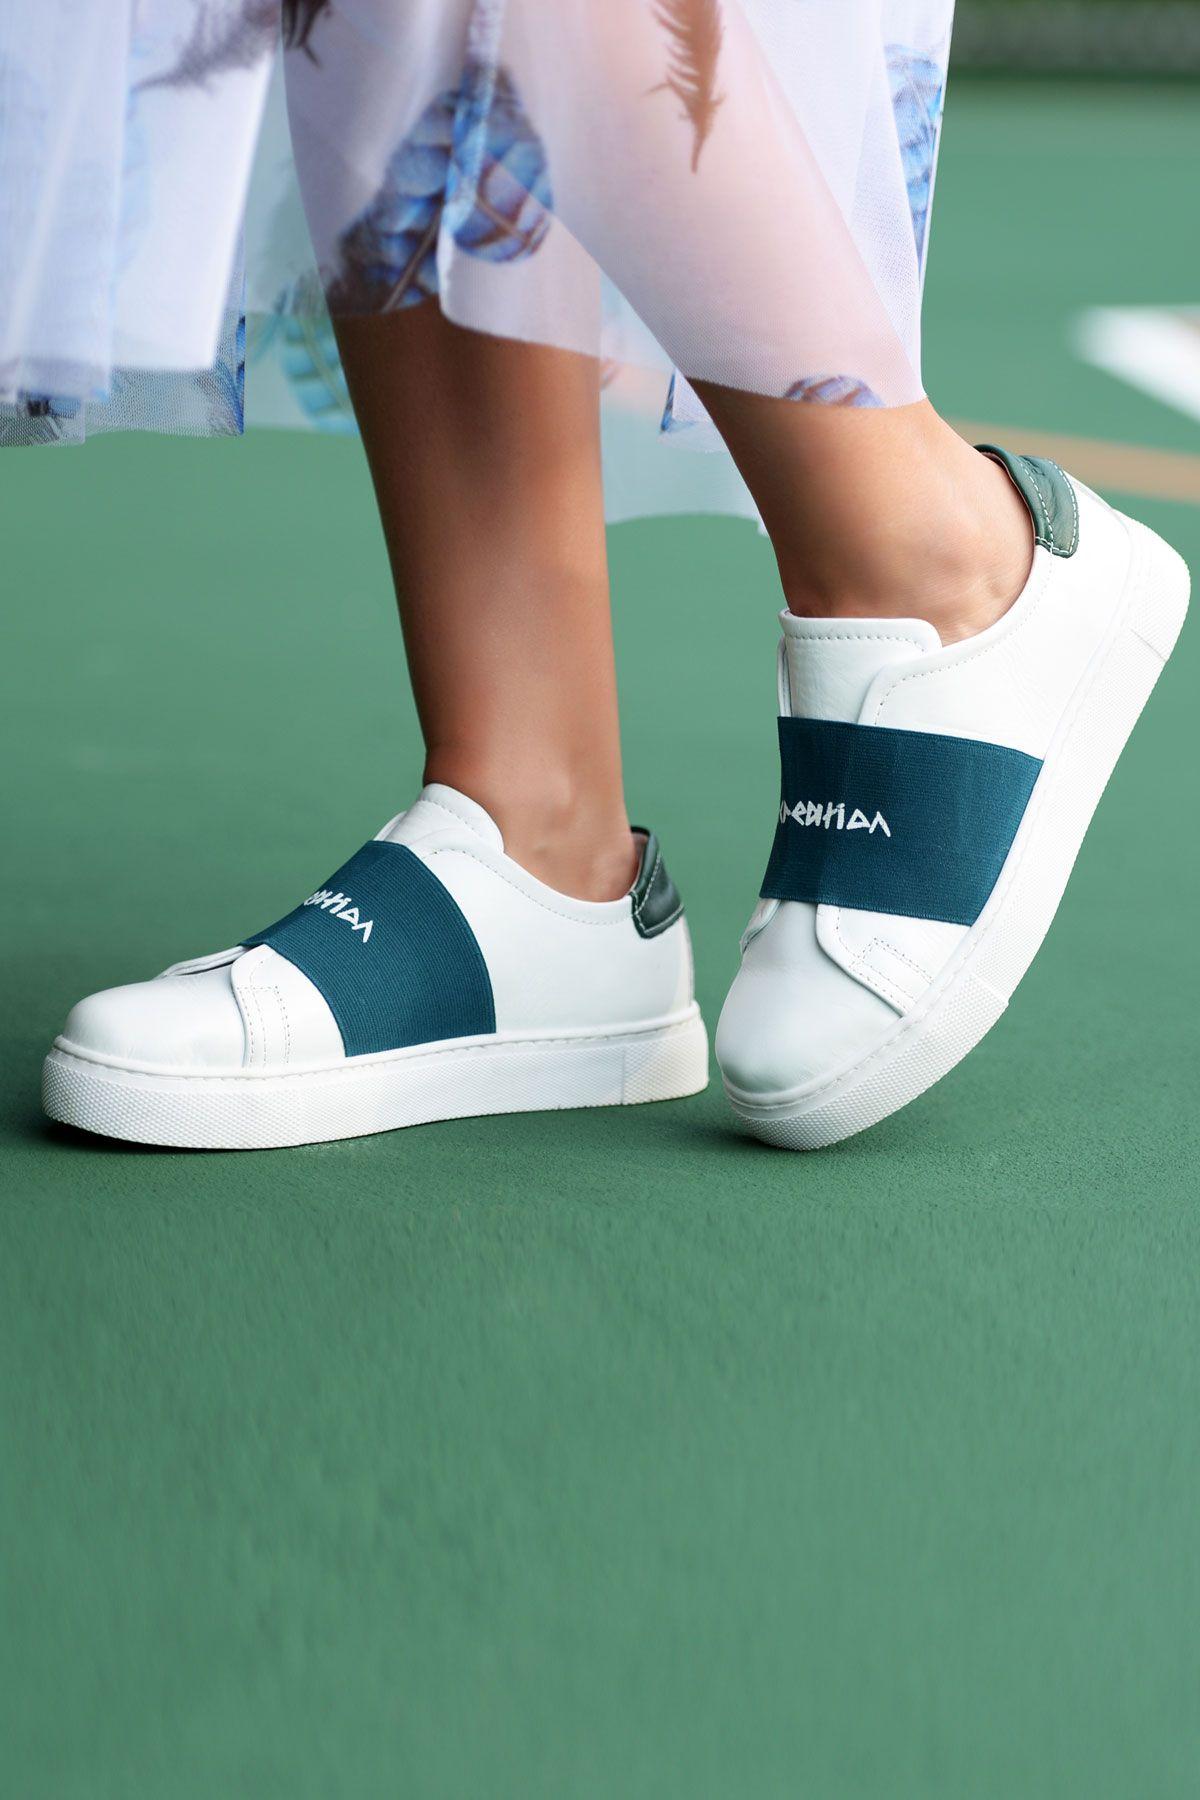 Pegia Recreation Hakiki Deri Bayan Sneaker 19REC101 Petrol Mavisi